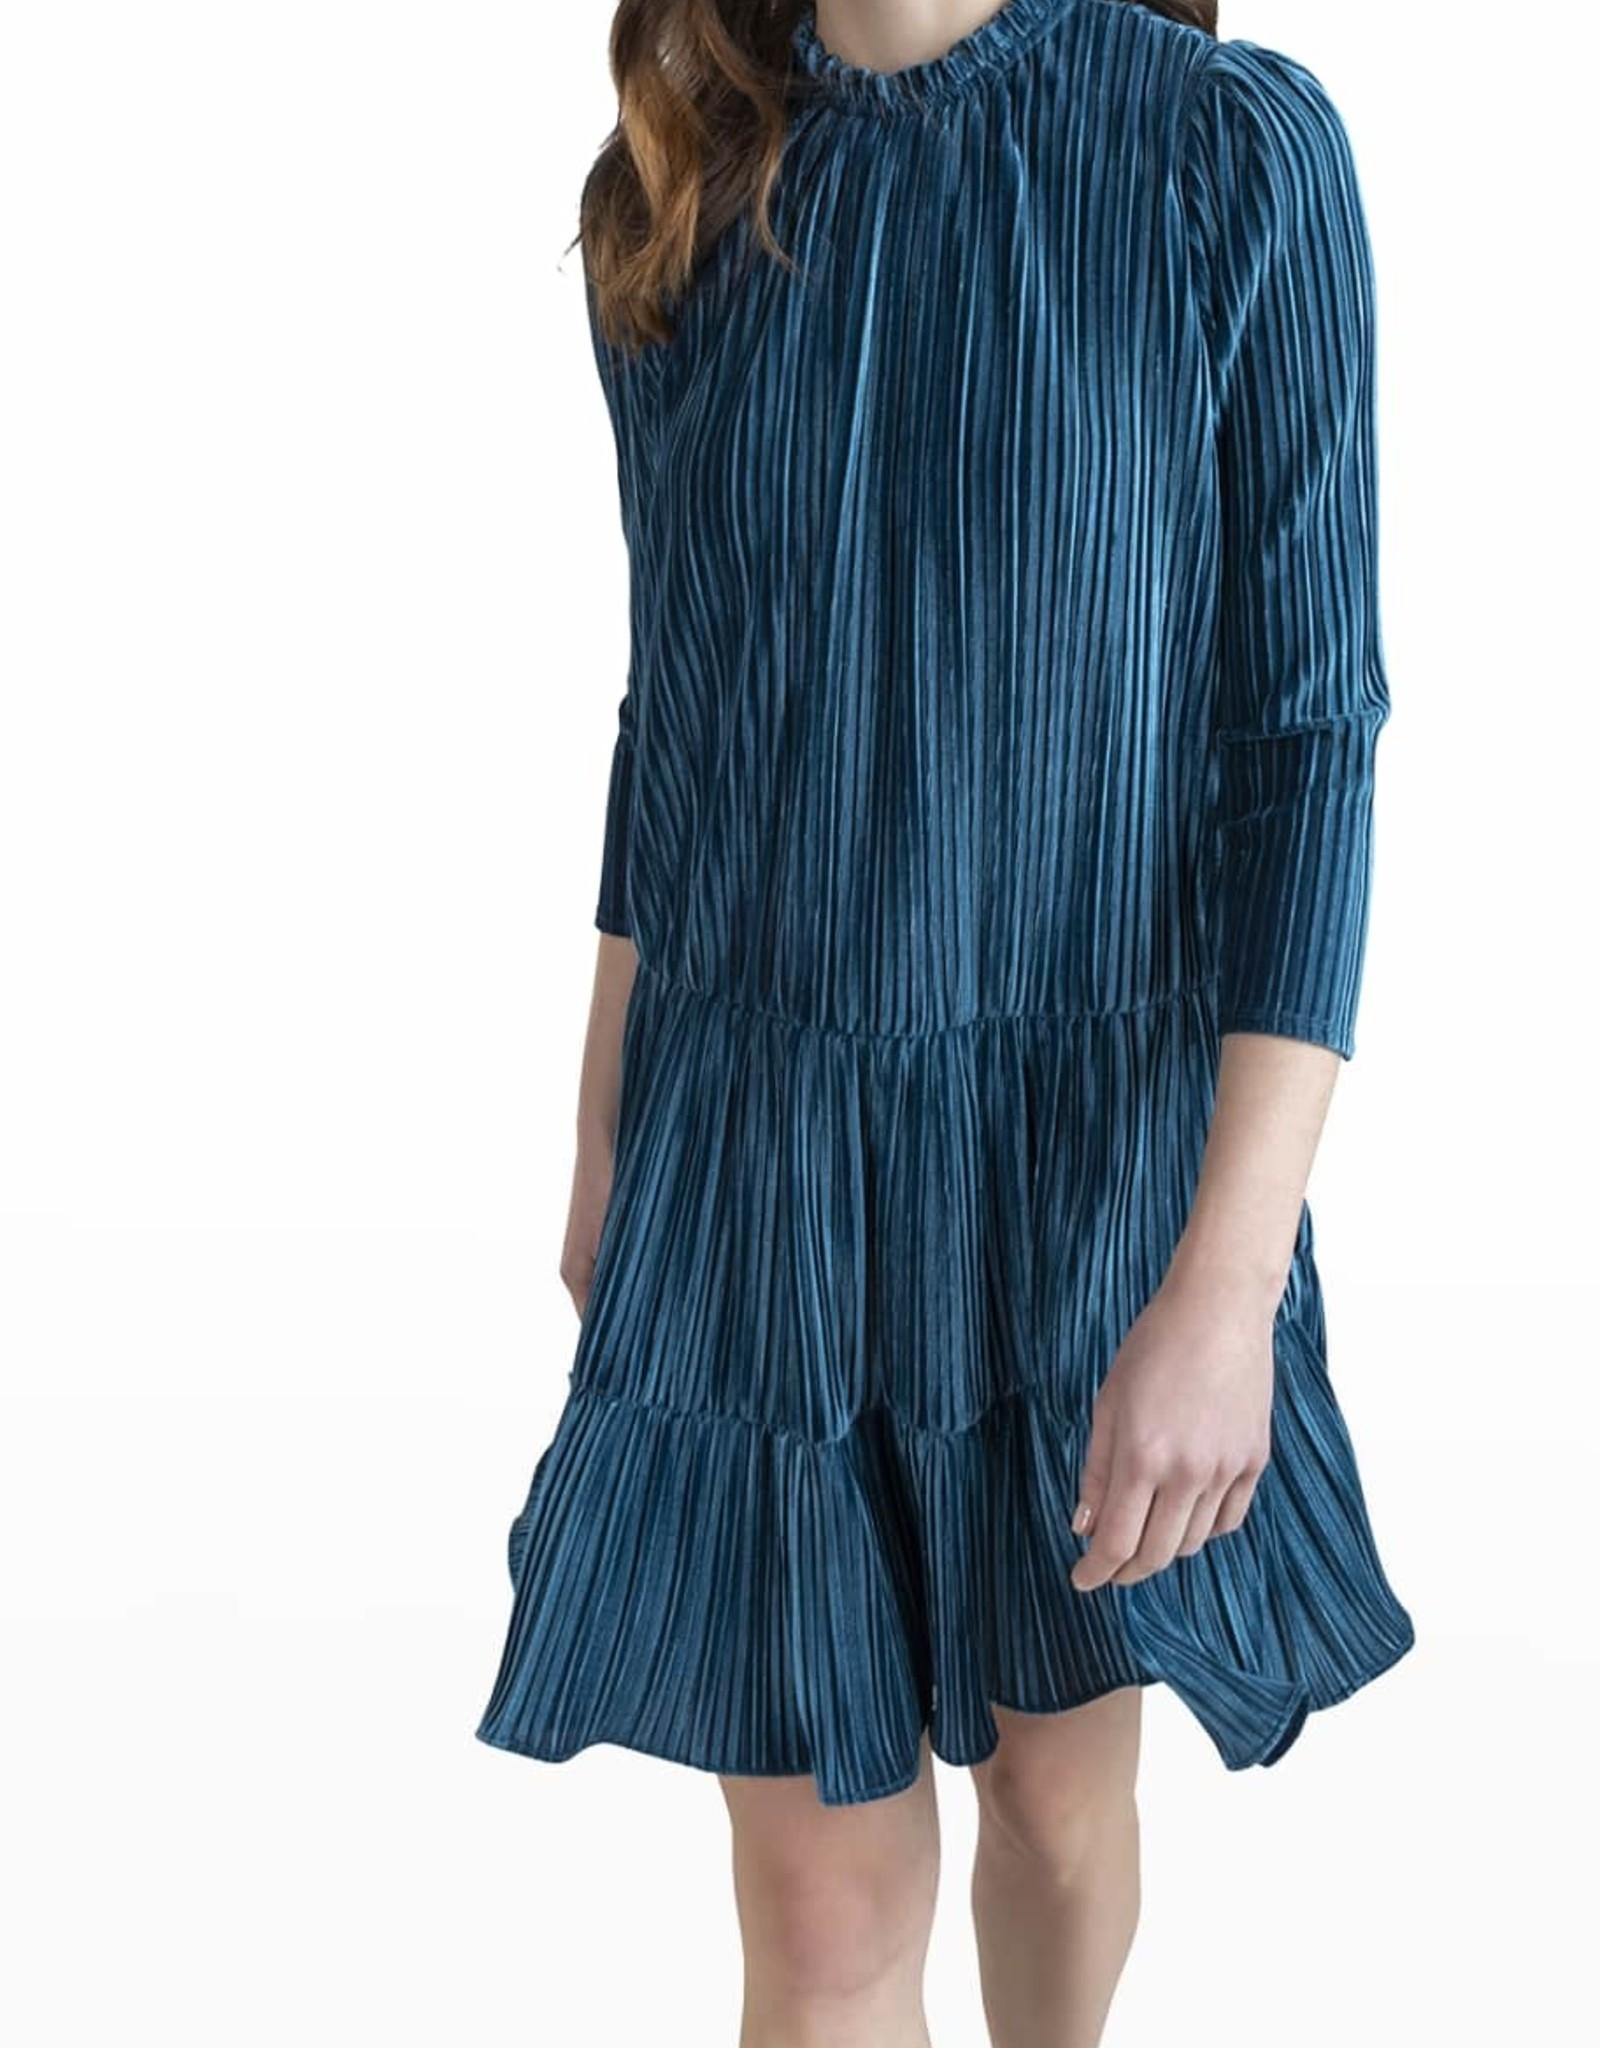 Shoshanna Westbrook Dress